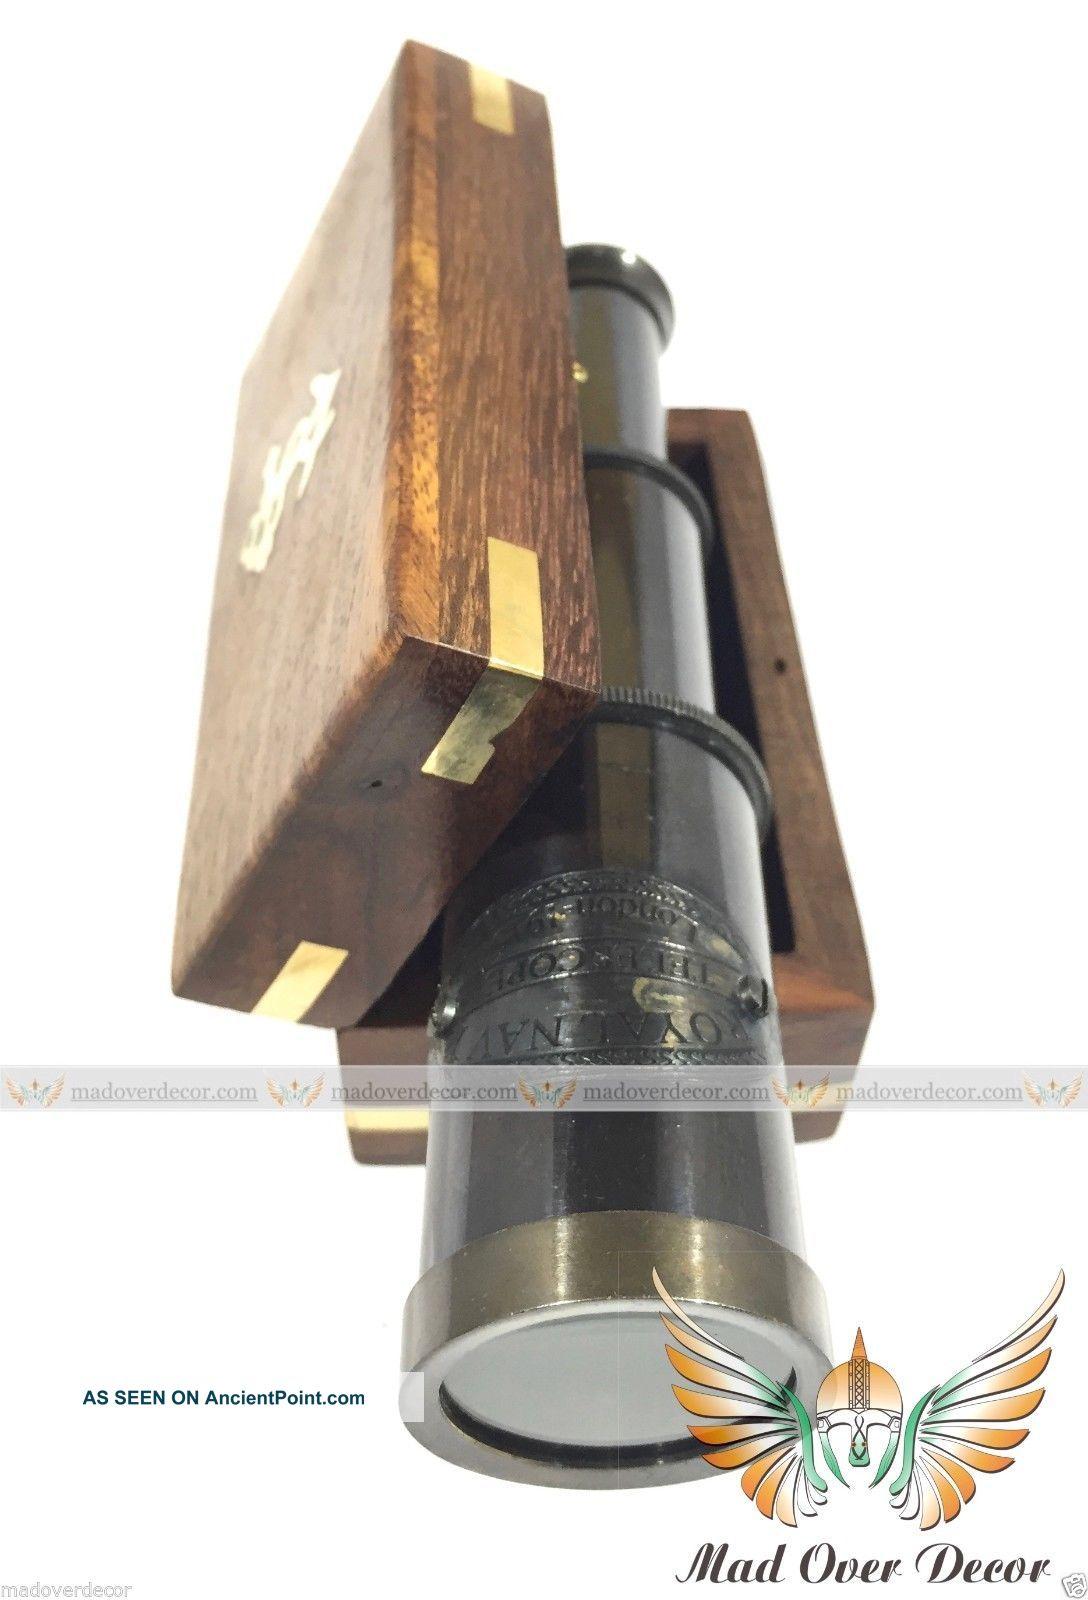 Vintage Pocket Antique Monocular Telescope Nautical Pirate Spyglass Scope Brass See more Vintage Pocket Antique Monocular Telescope Nau... photo